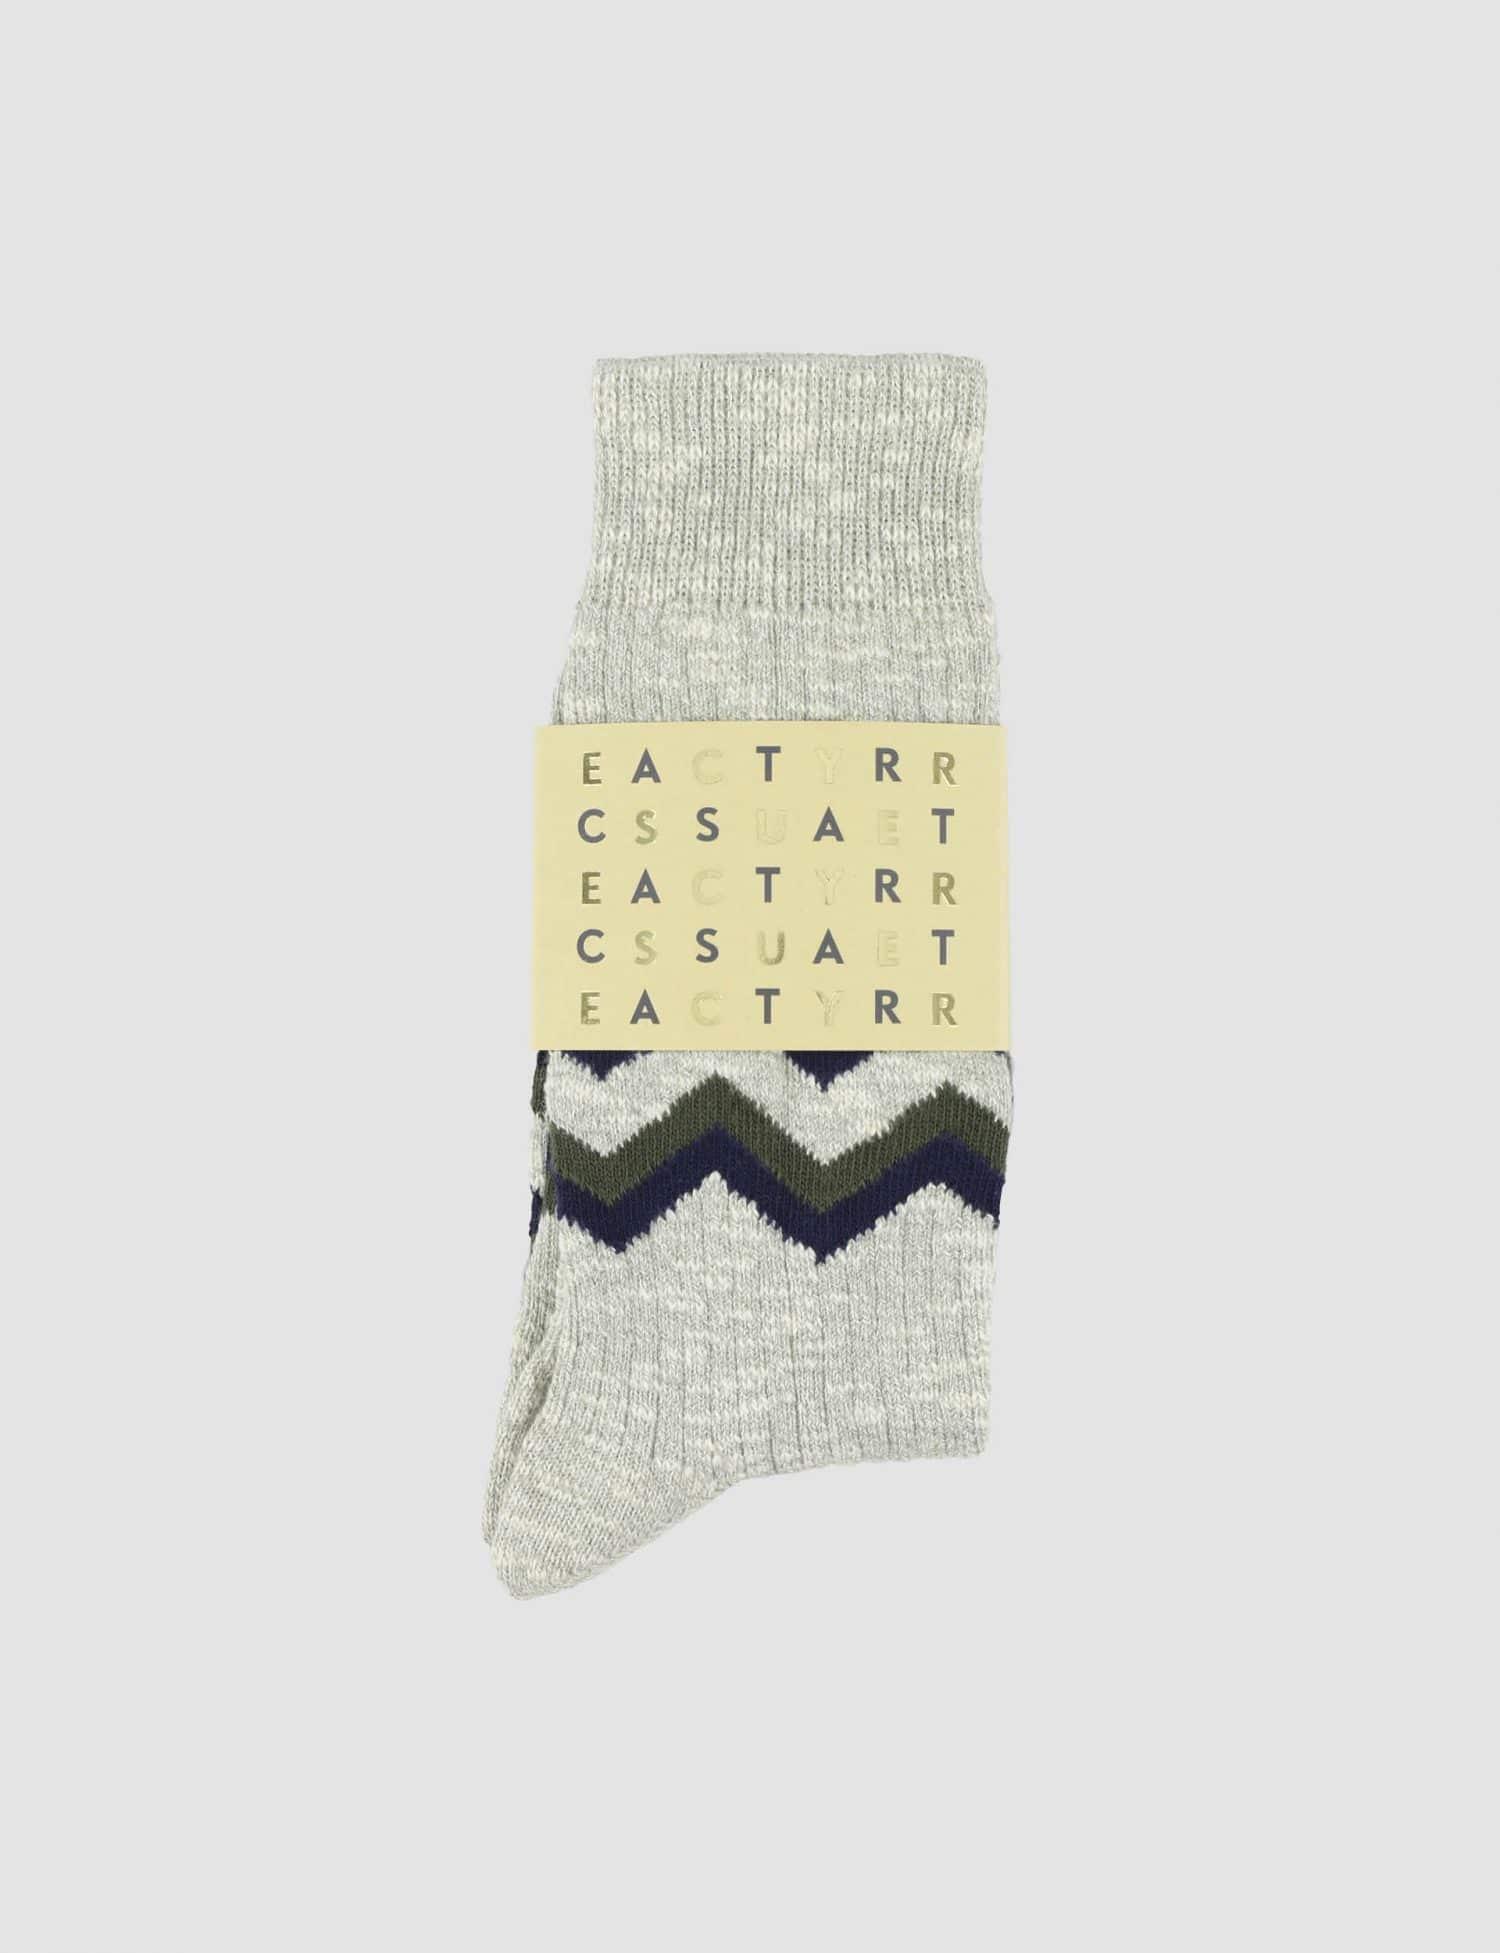 Castart x Escuyer - Zigzag - Middle Grey